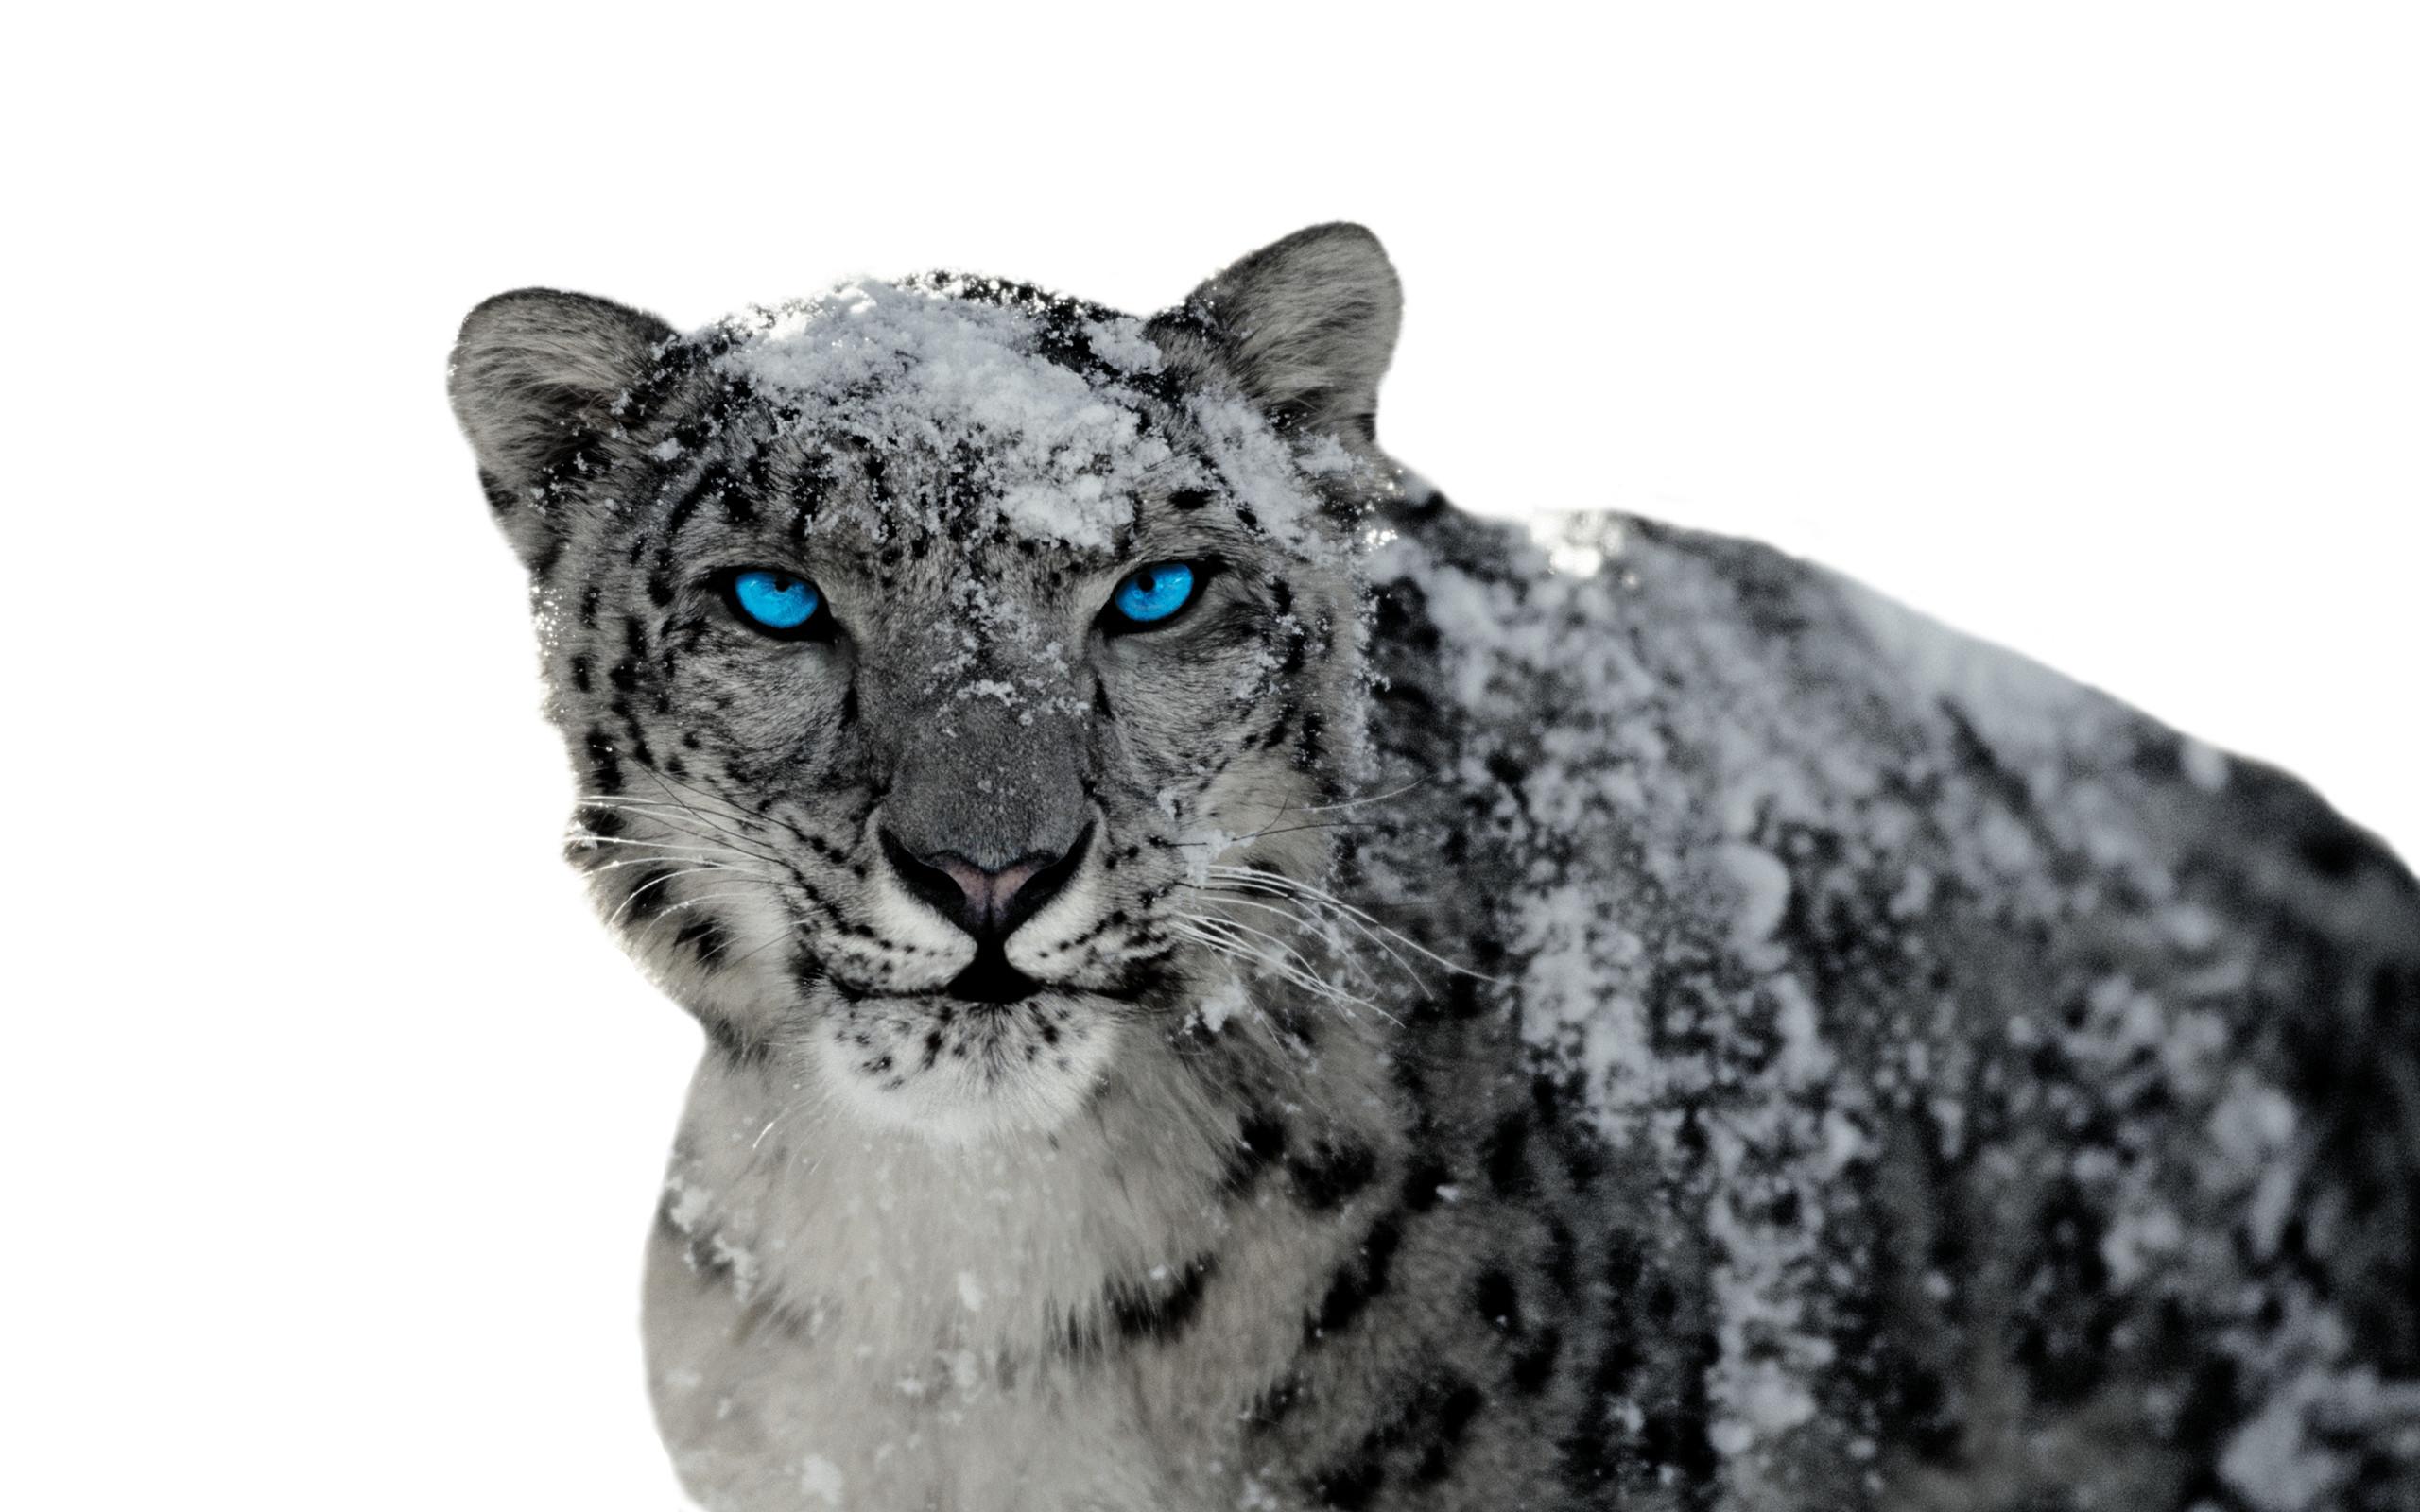 Mac Wallpaper Snow Leopard (64+ Images